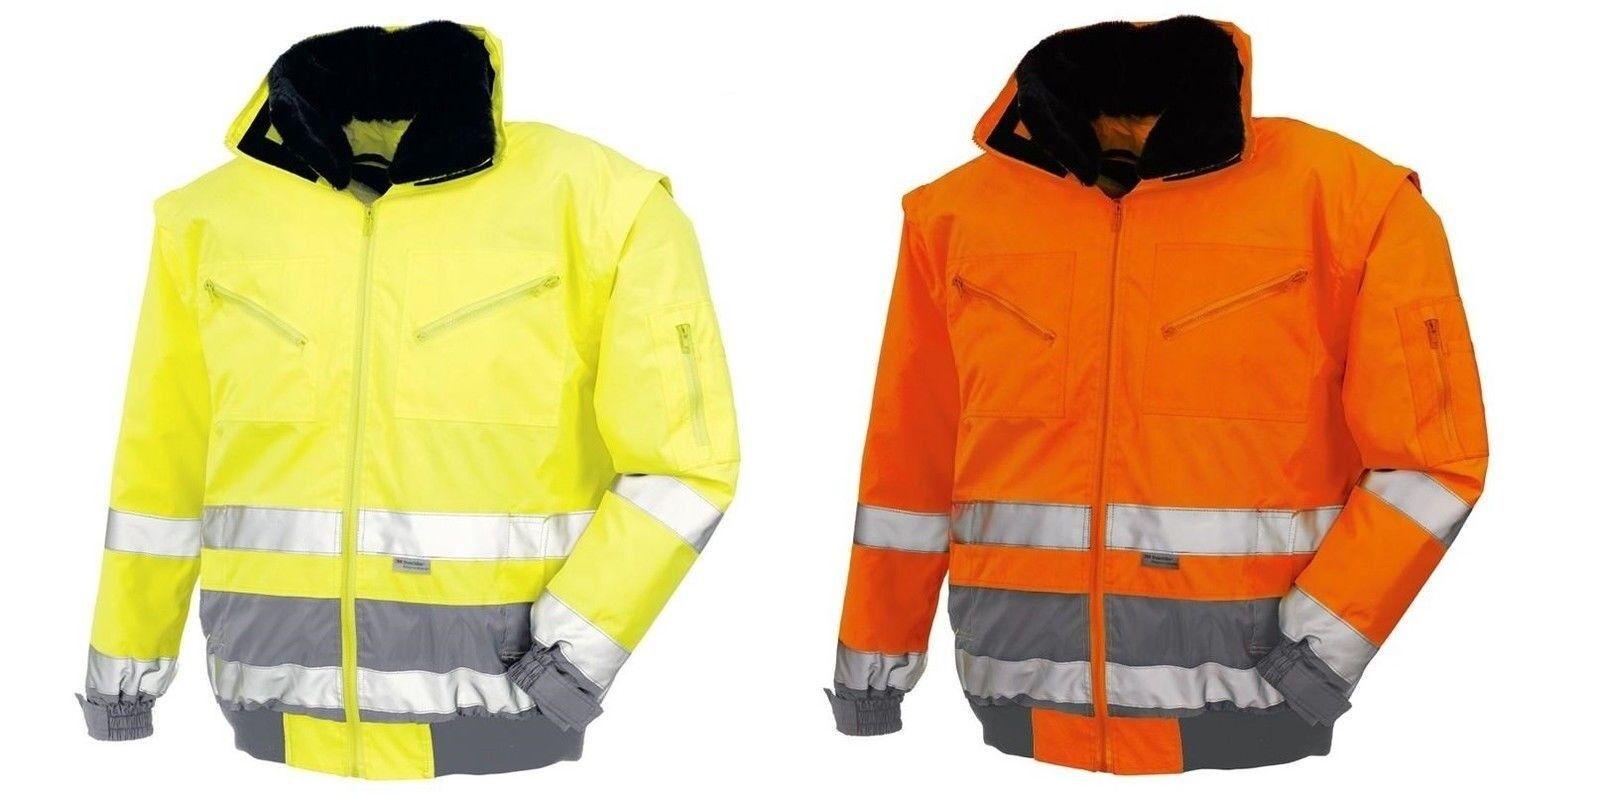 Texxor Warnschutz-pilotenjacke Vancouver 4107 Orange Gr Sonstige L Neu